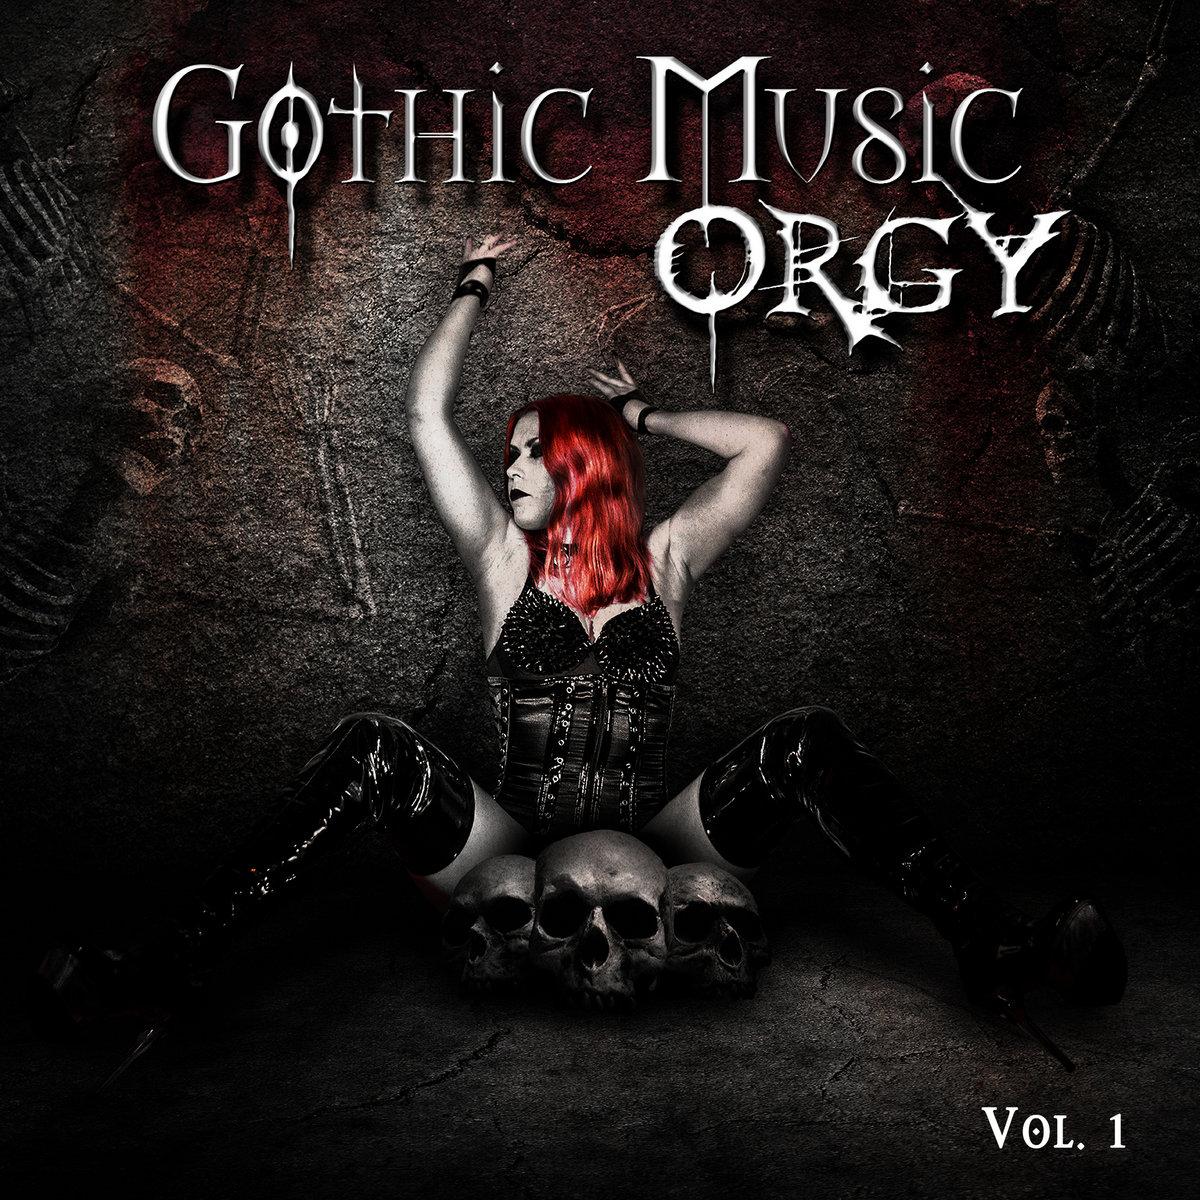 orgie band songs